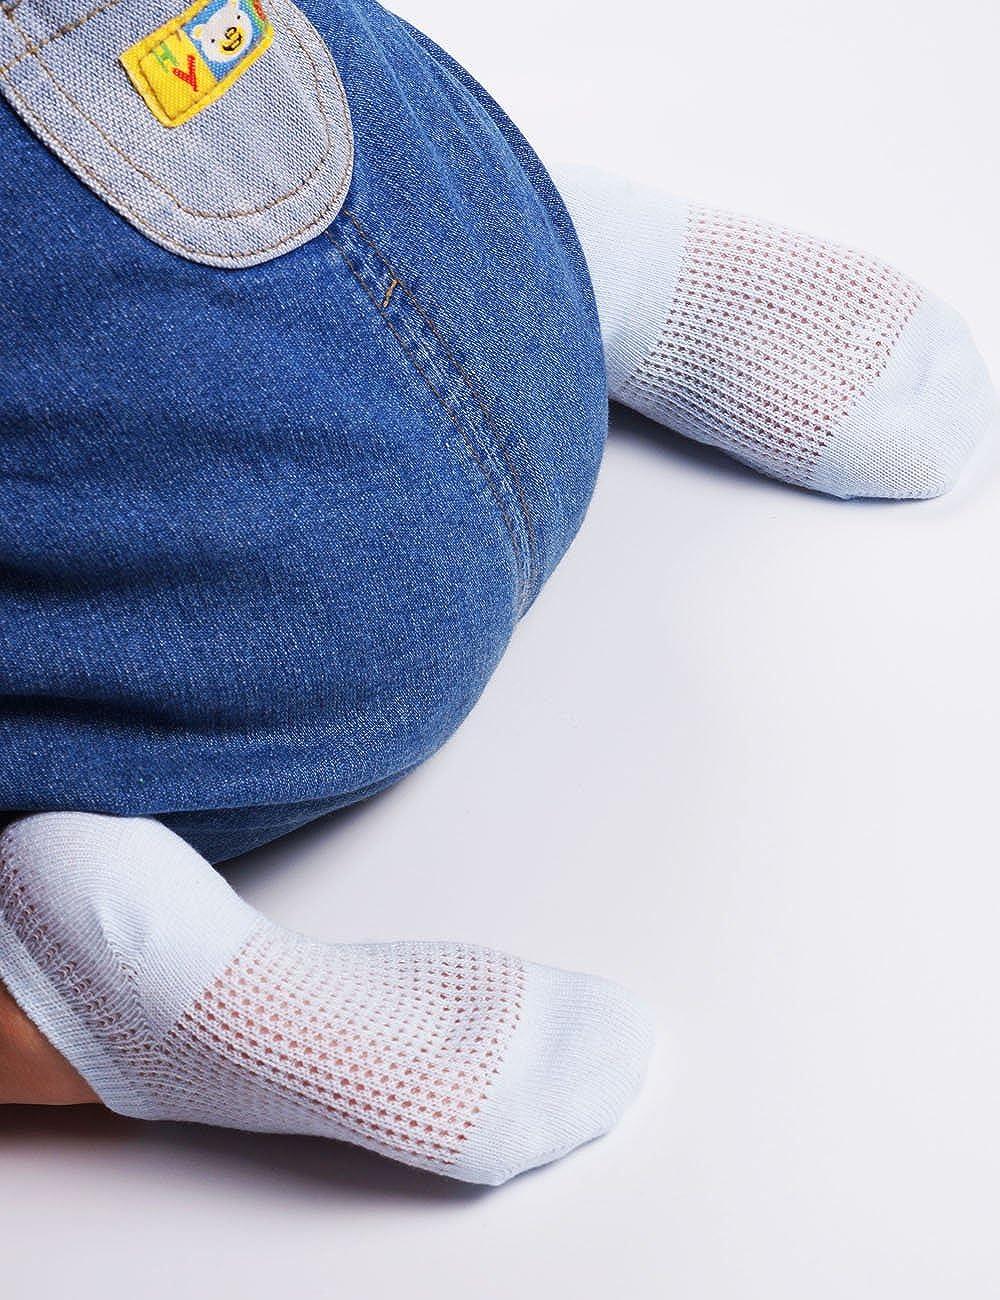 BabaMate 5 Pairs Toddler Little Kid Boys Girls No Show Ankle Socks Soft Cotton Thin Mesh Infant Baby Summer Socks